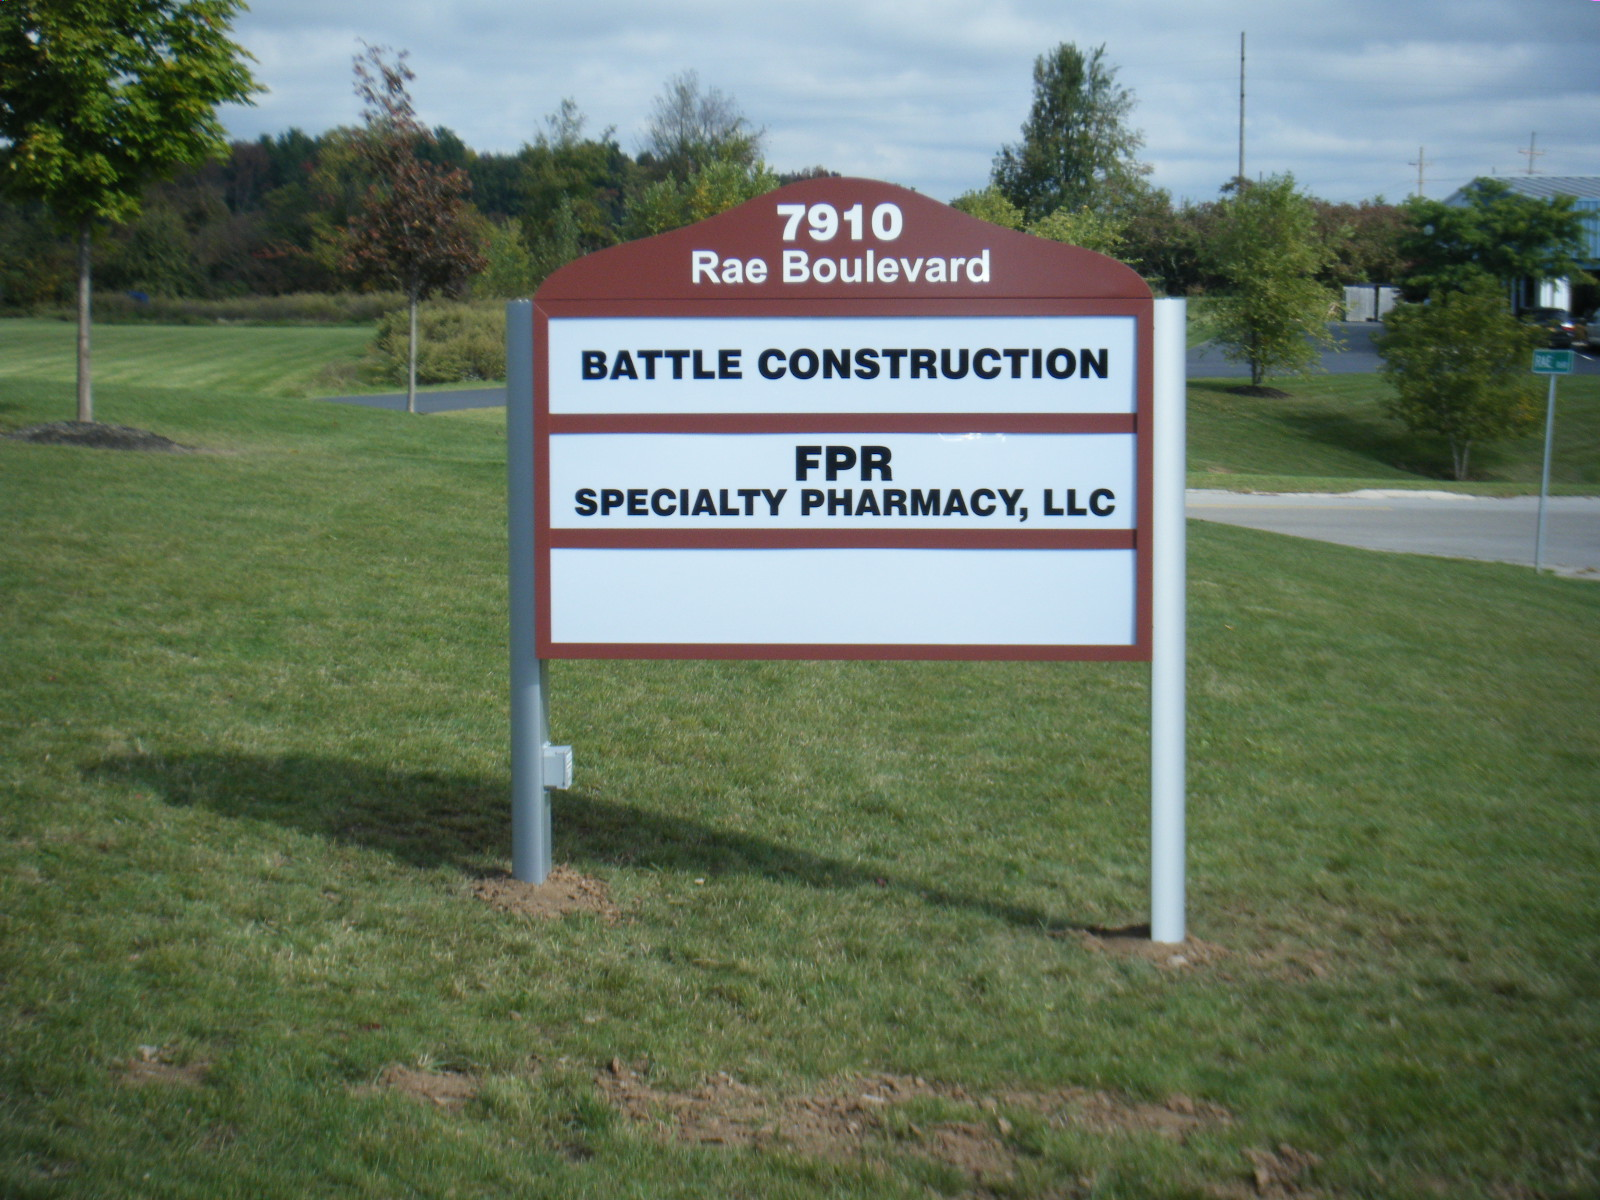 Battle Construcion P+P.JPG